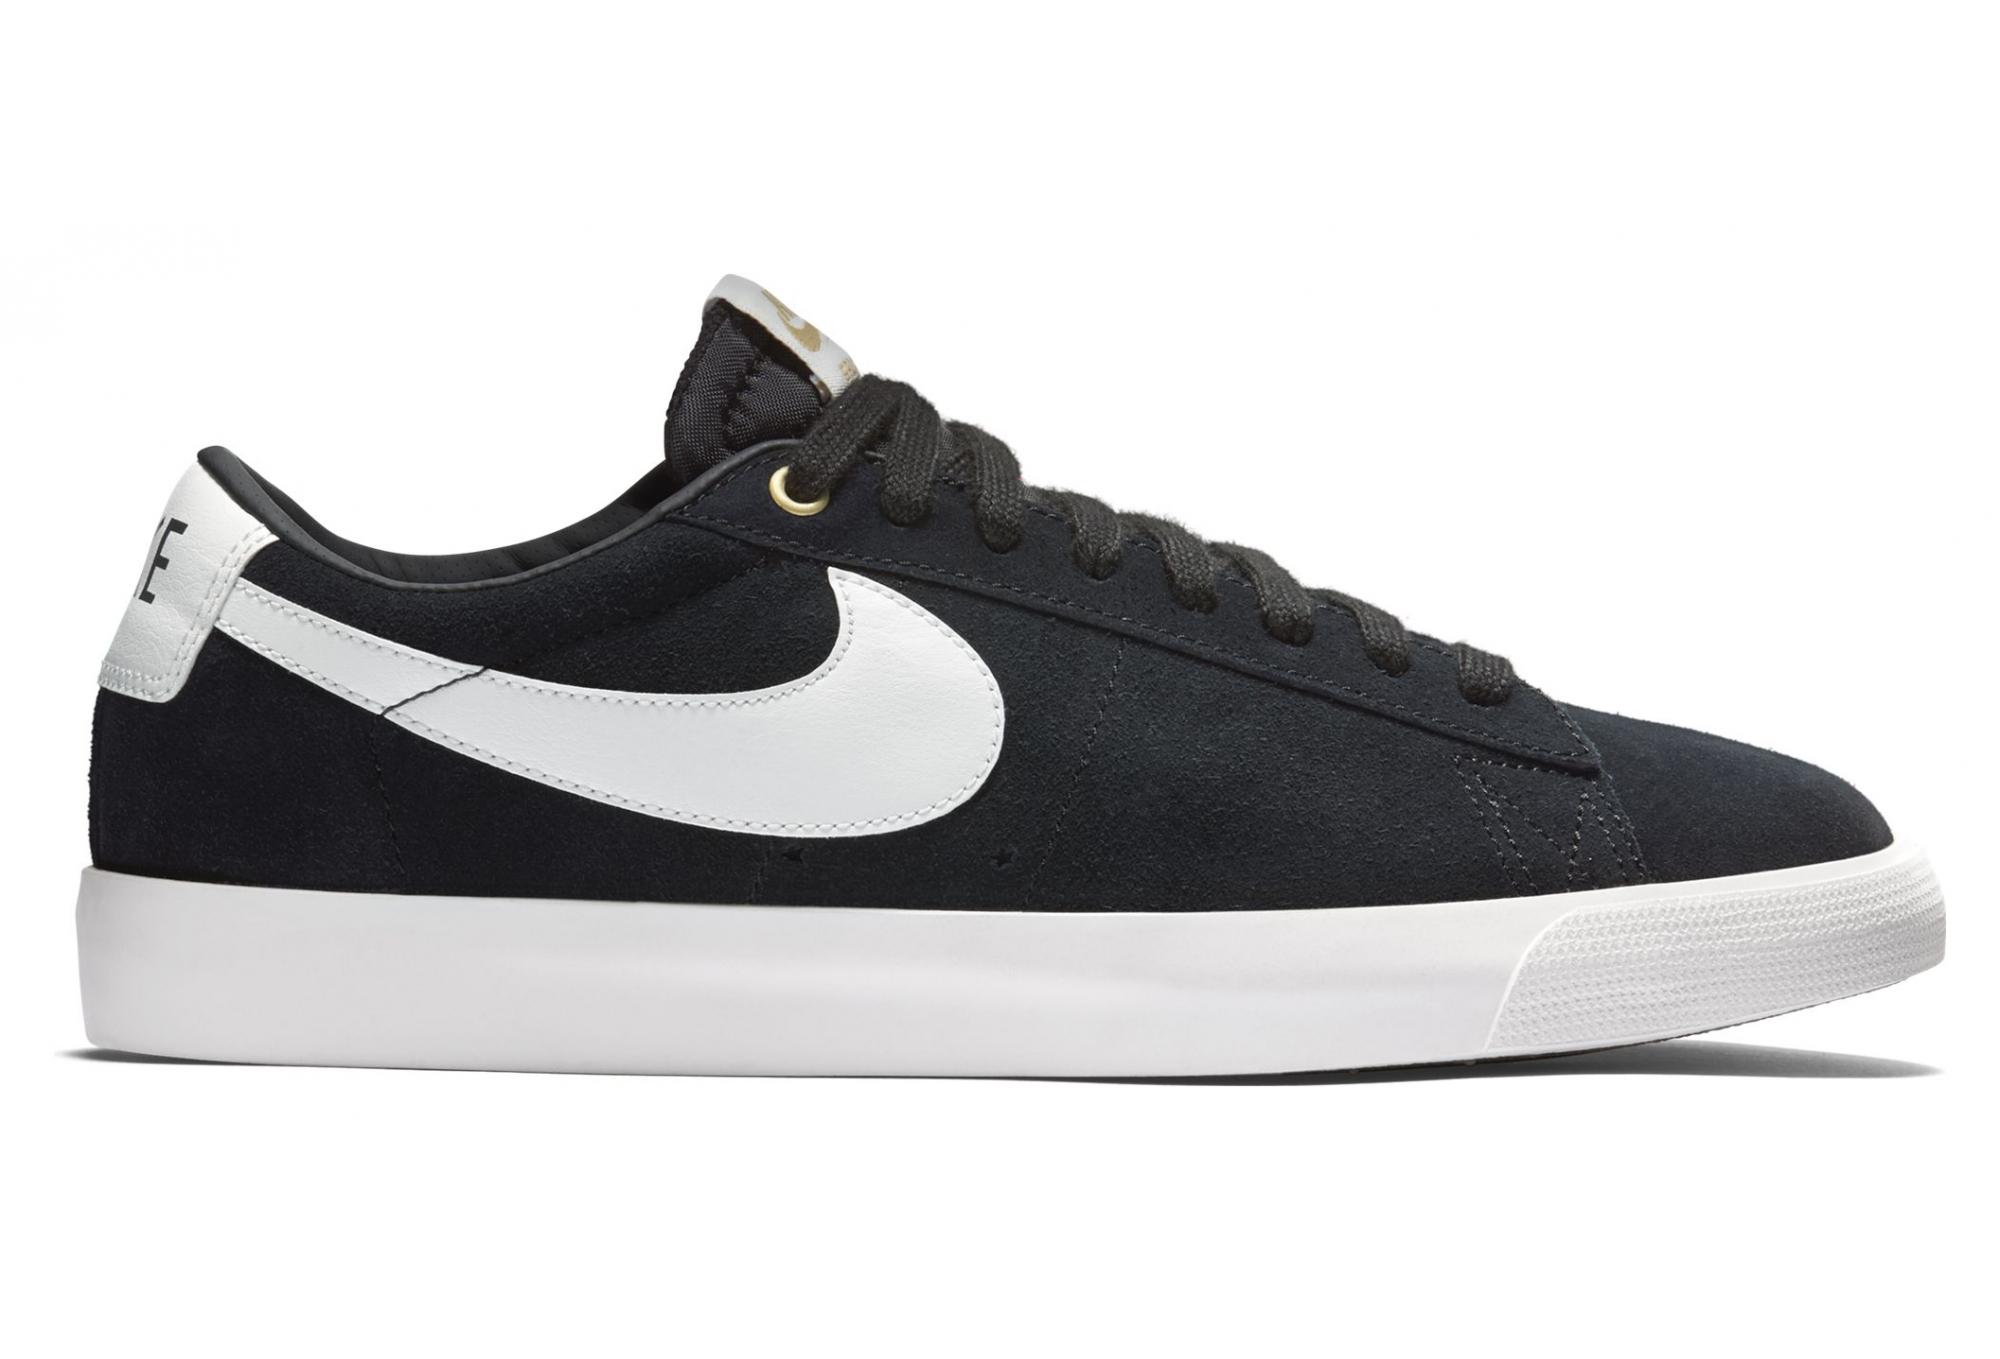 Nike SB Blazer Low GT Sneaker Black White   Alltricks.com